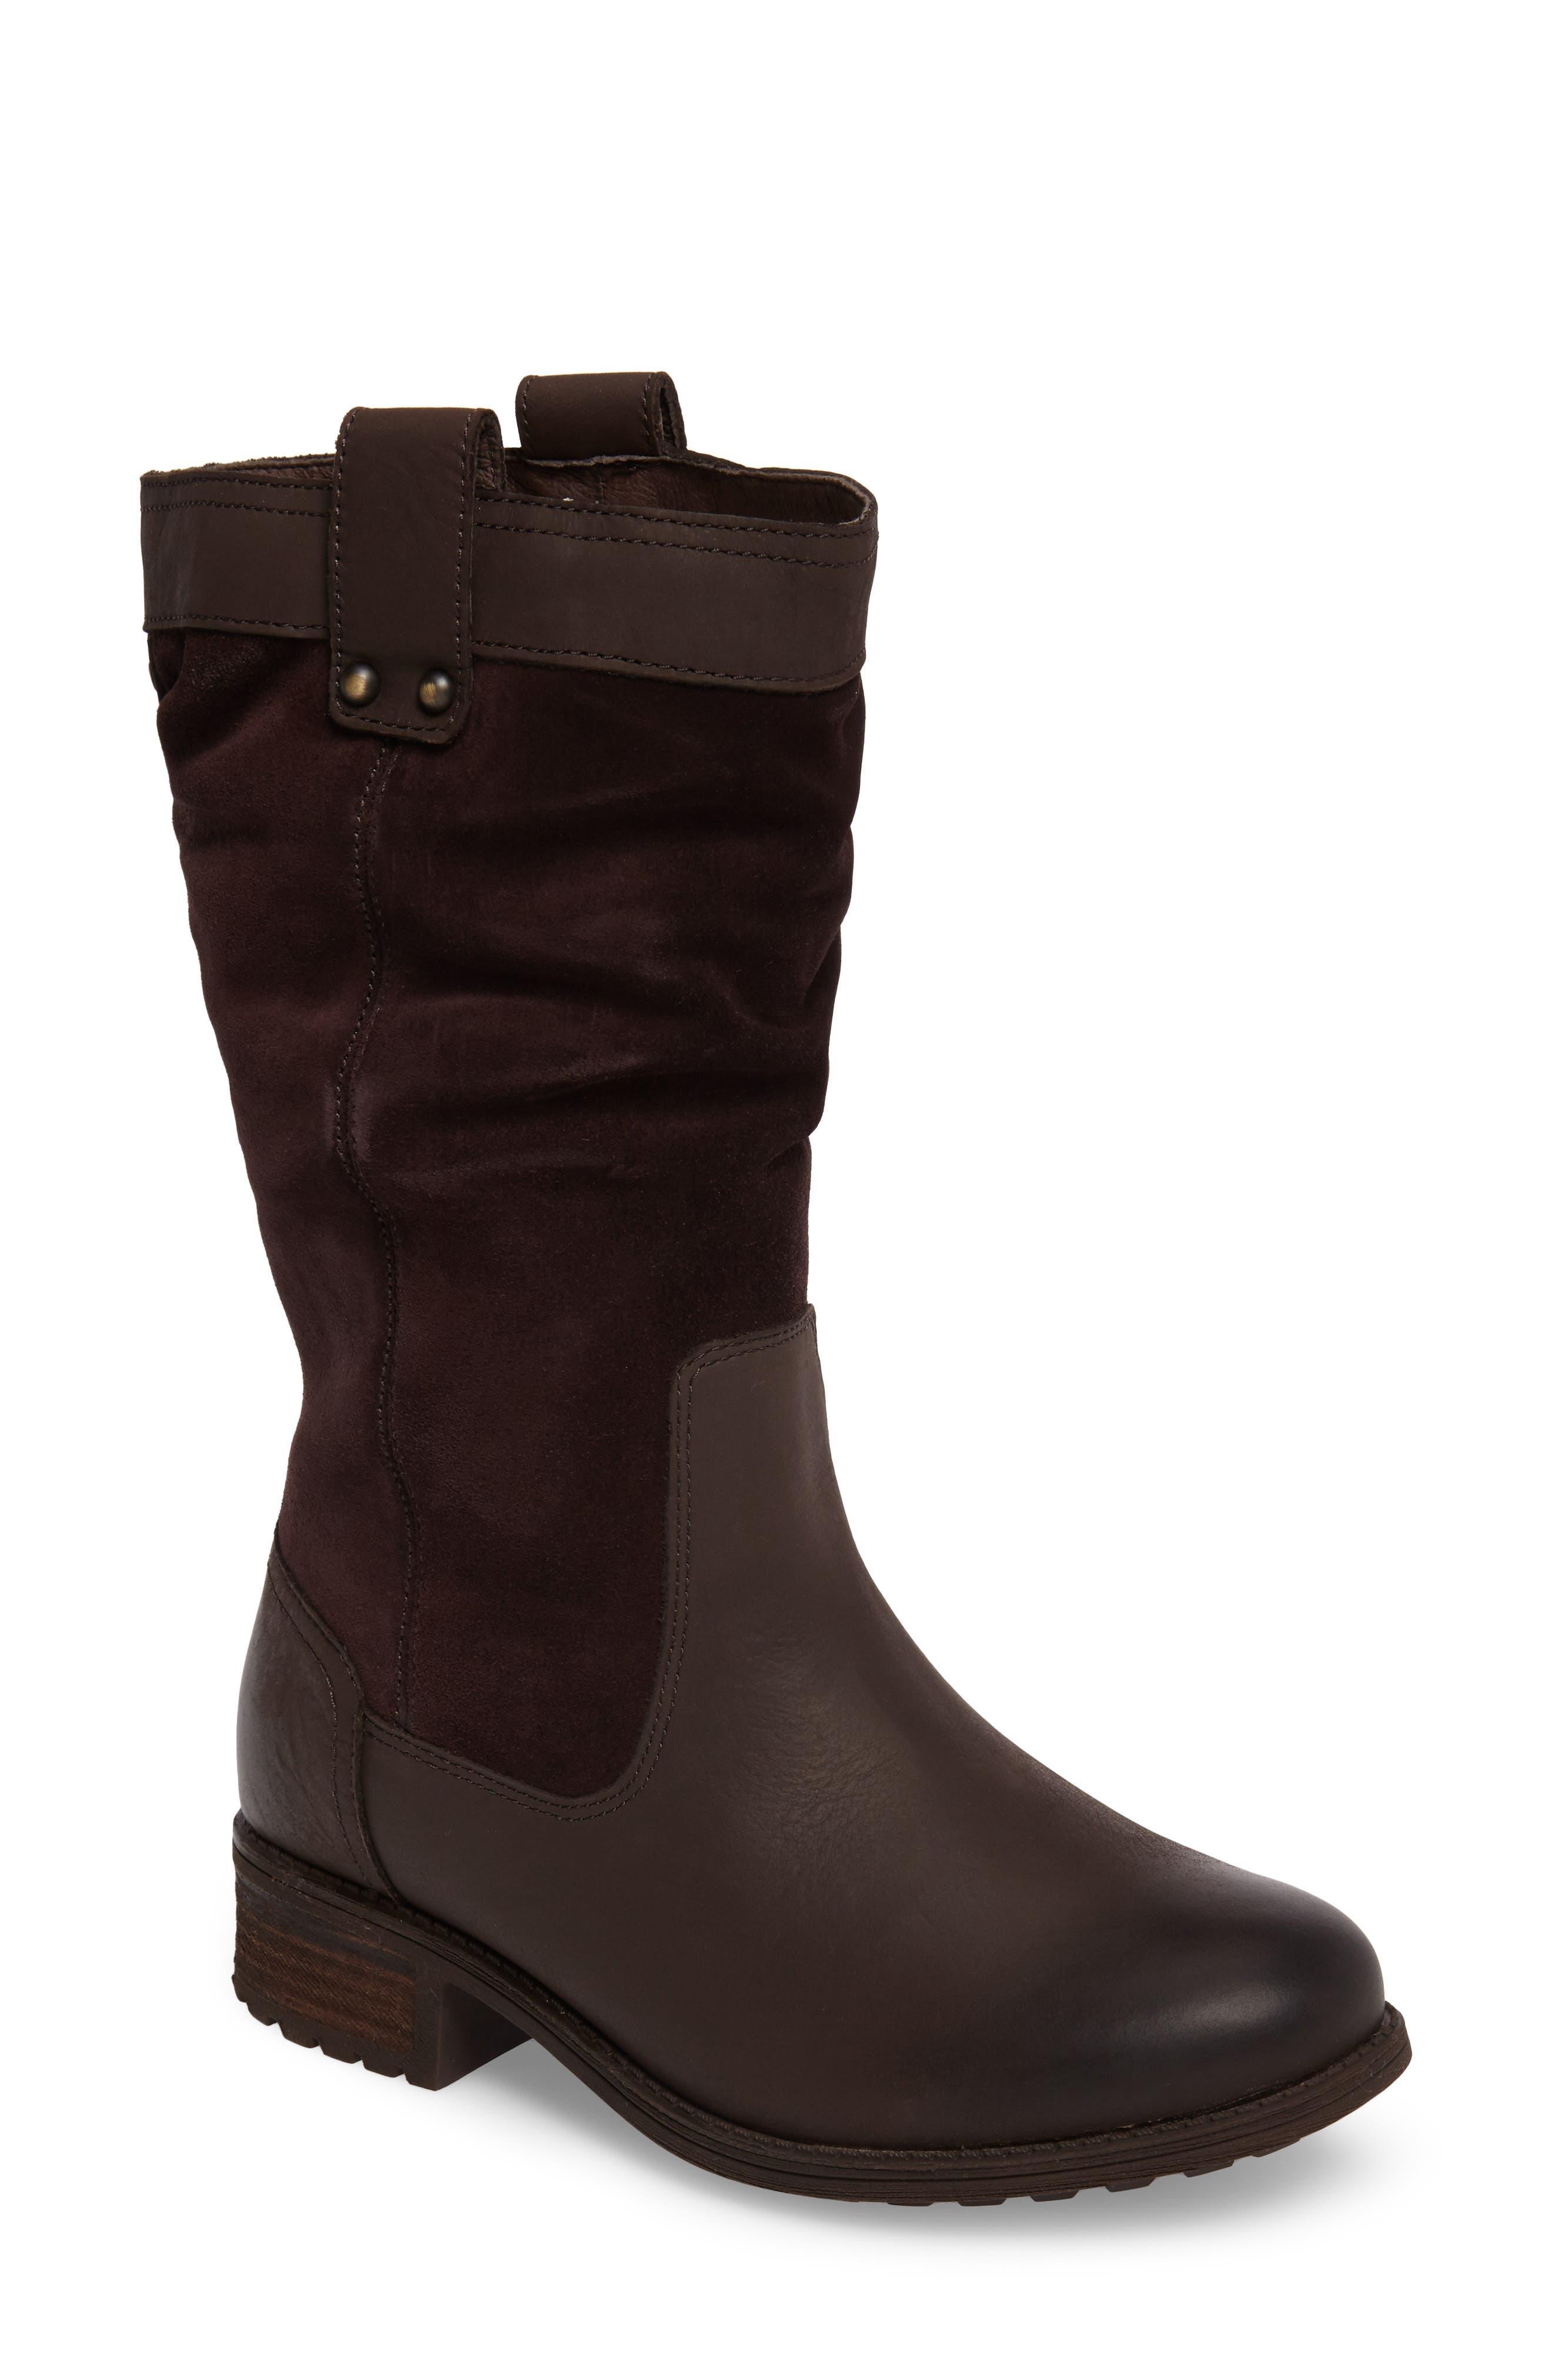 Alternate Image 1 Selected - UGG® Bruckner Water Resistant Slouch Boot (Women)